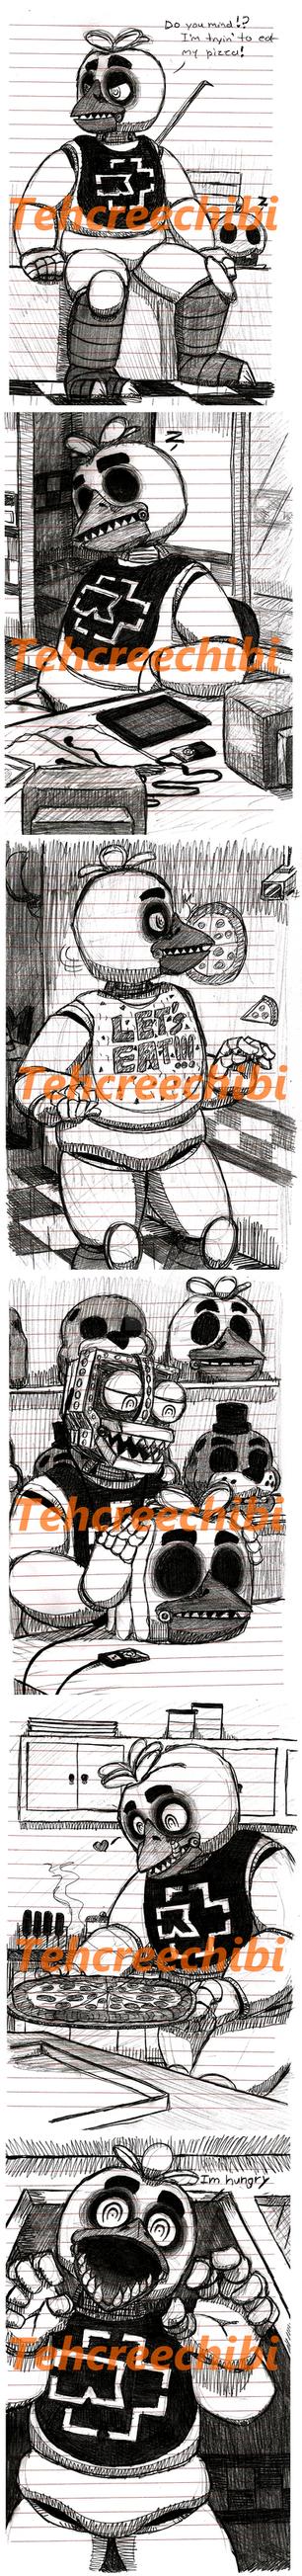 Chica Sketch Dump by tehcreechibi